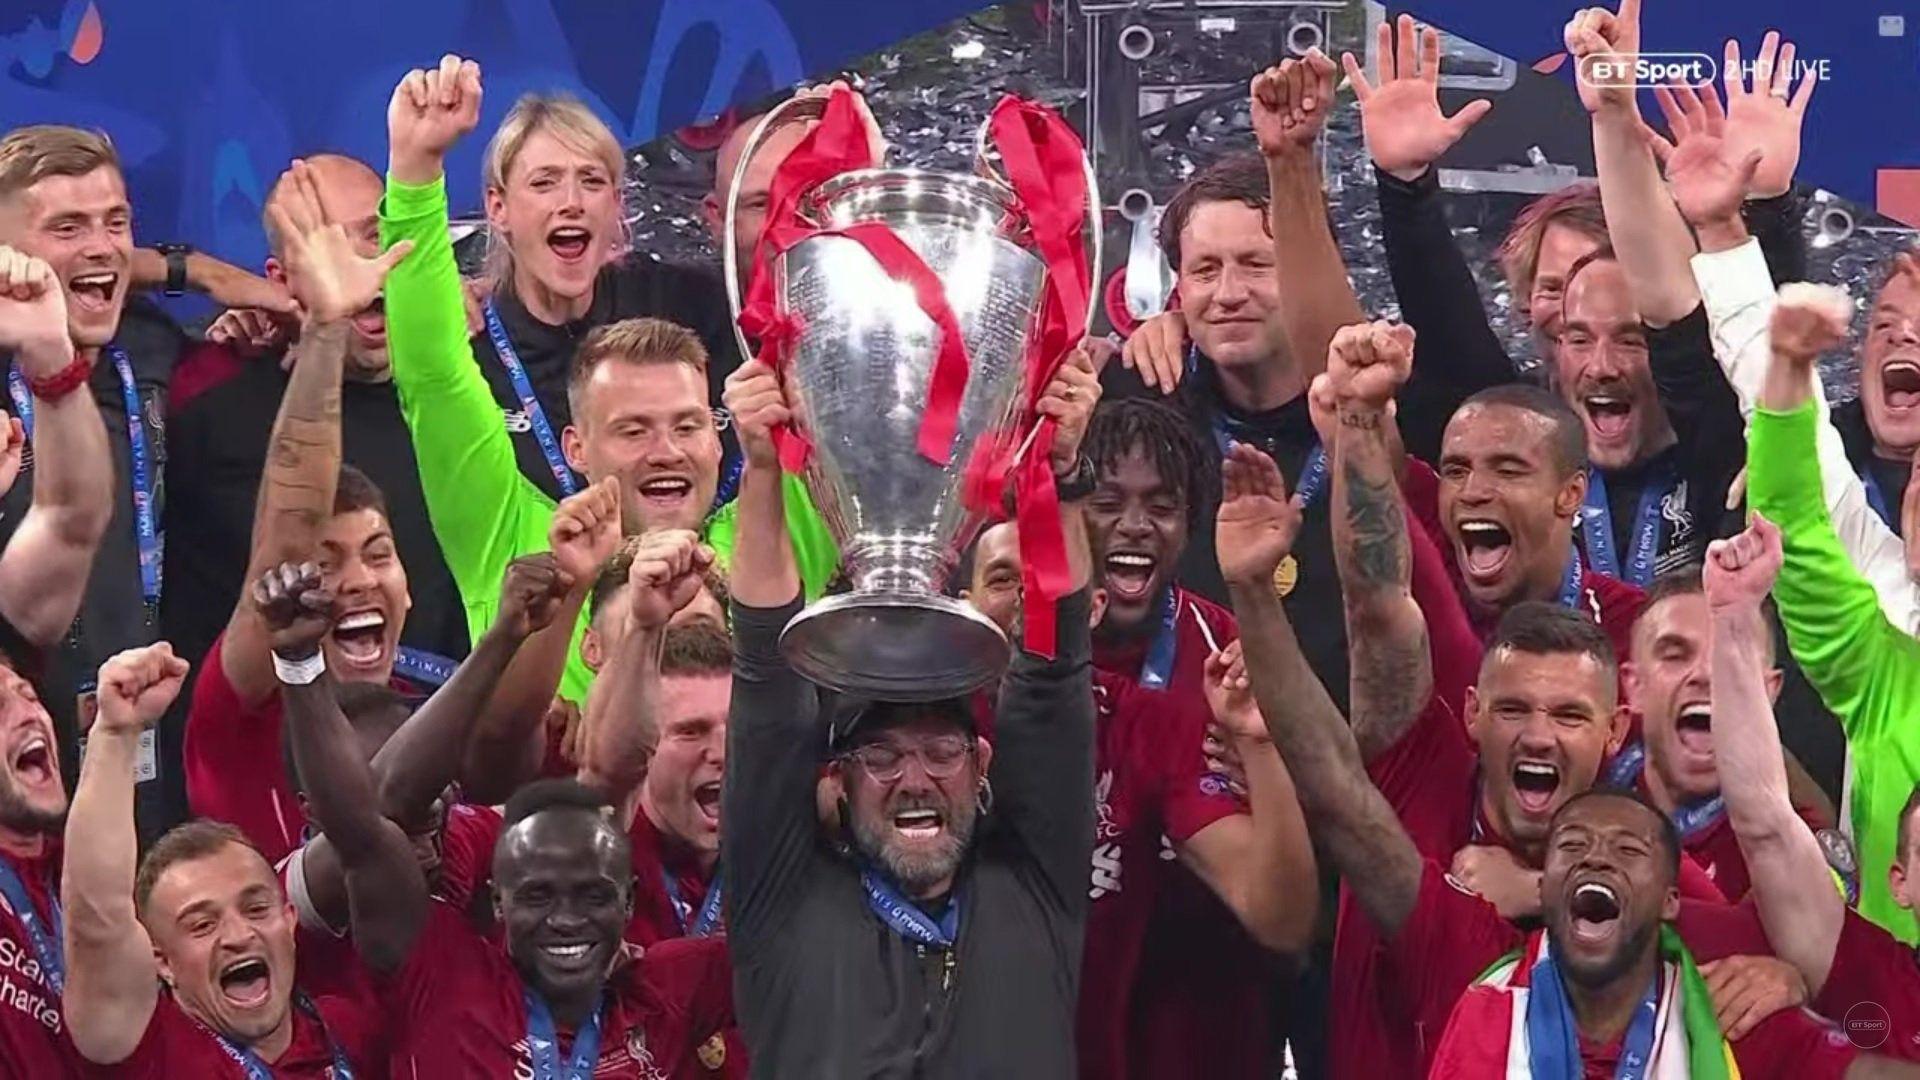 Pin on Liverpool FC YNWA⚽️